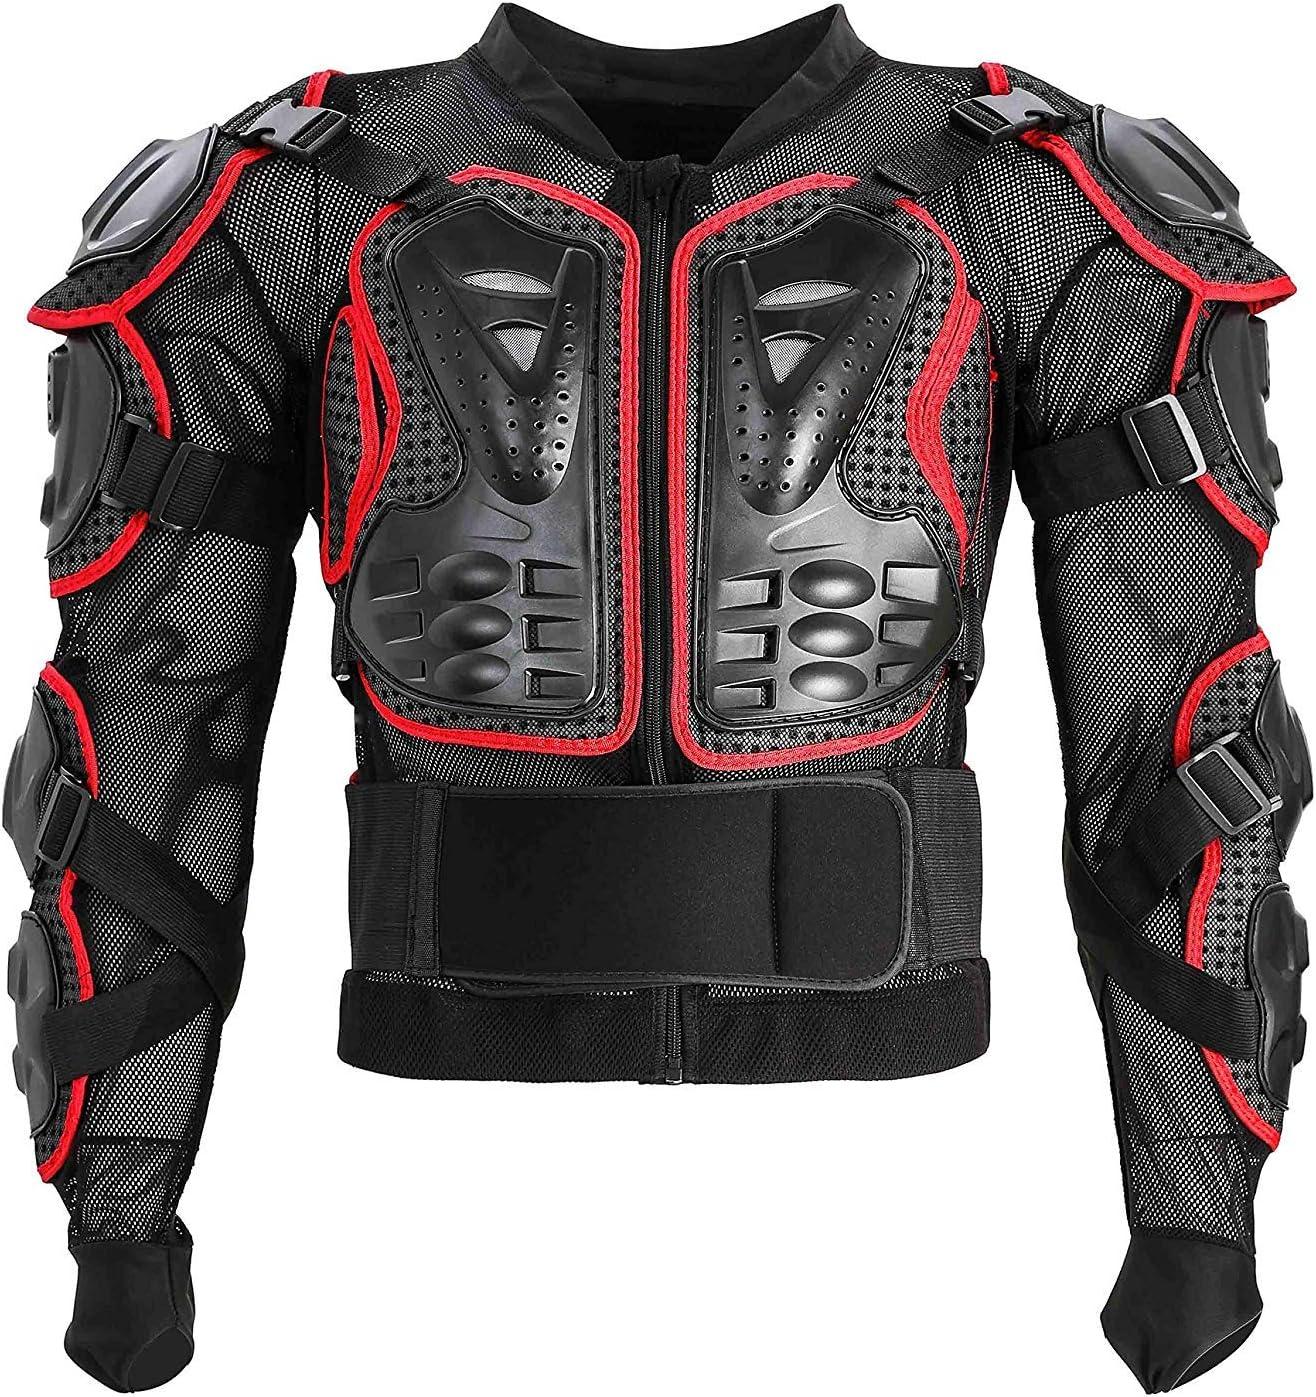 XL Naranja Chaqueta Protectora para Motocicleta GearX Impermeable t/érmico Desmontable